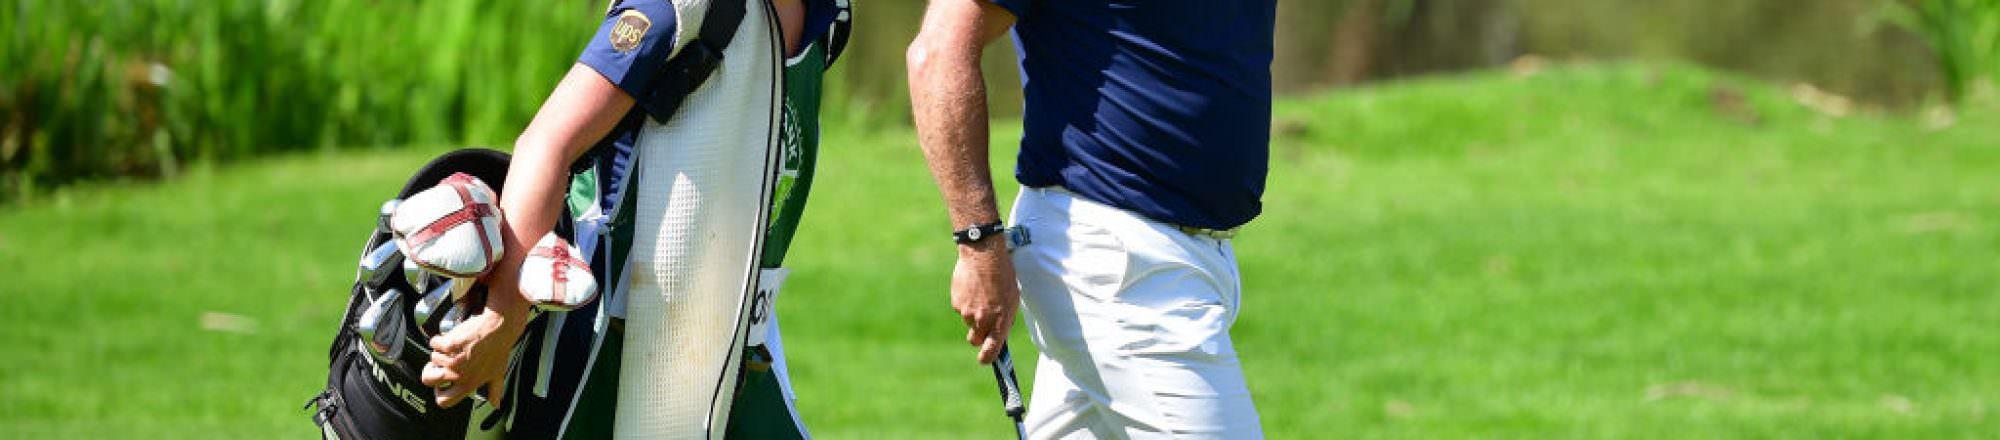 Final Nedbank Golf Challenge leaderboard